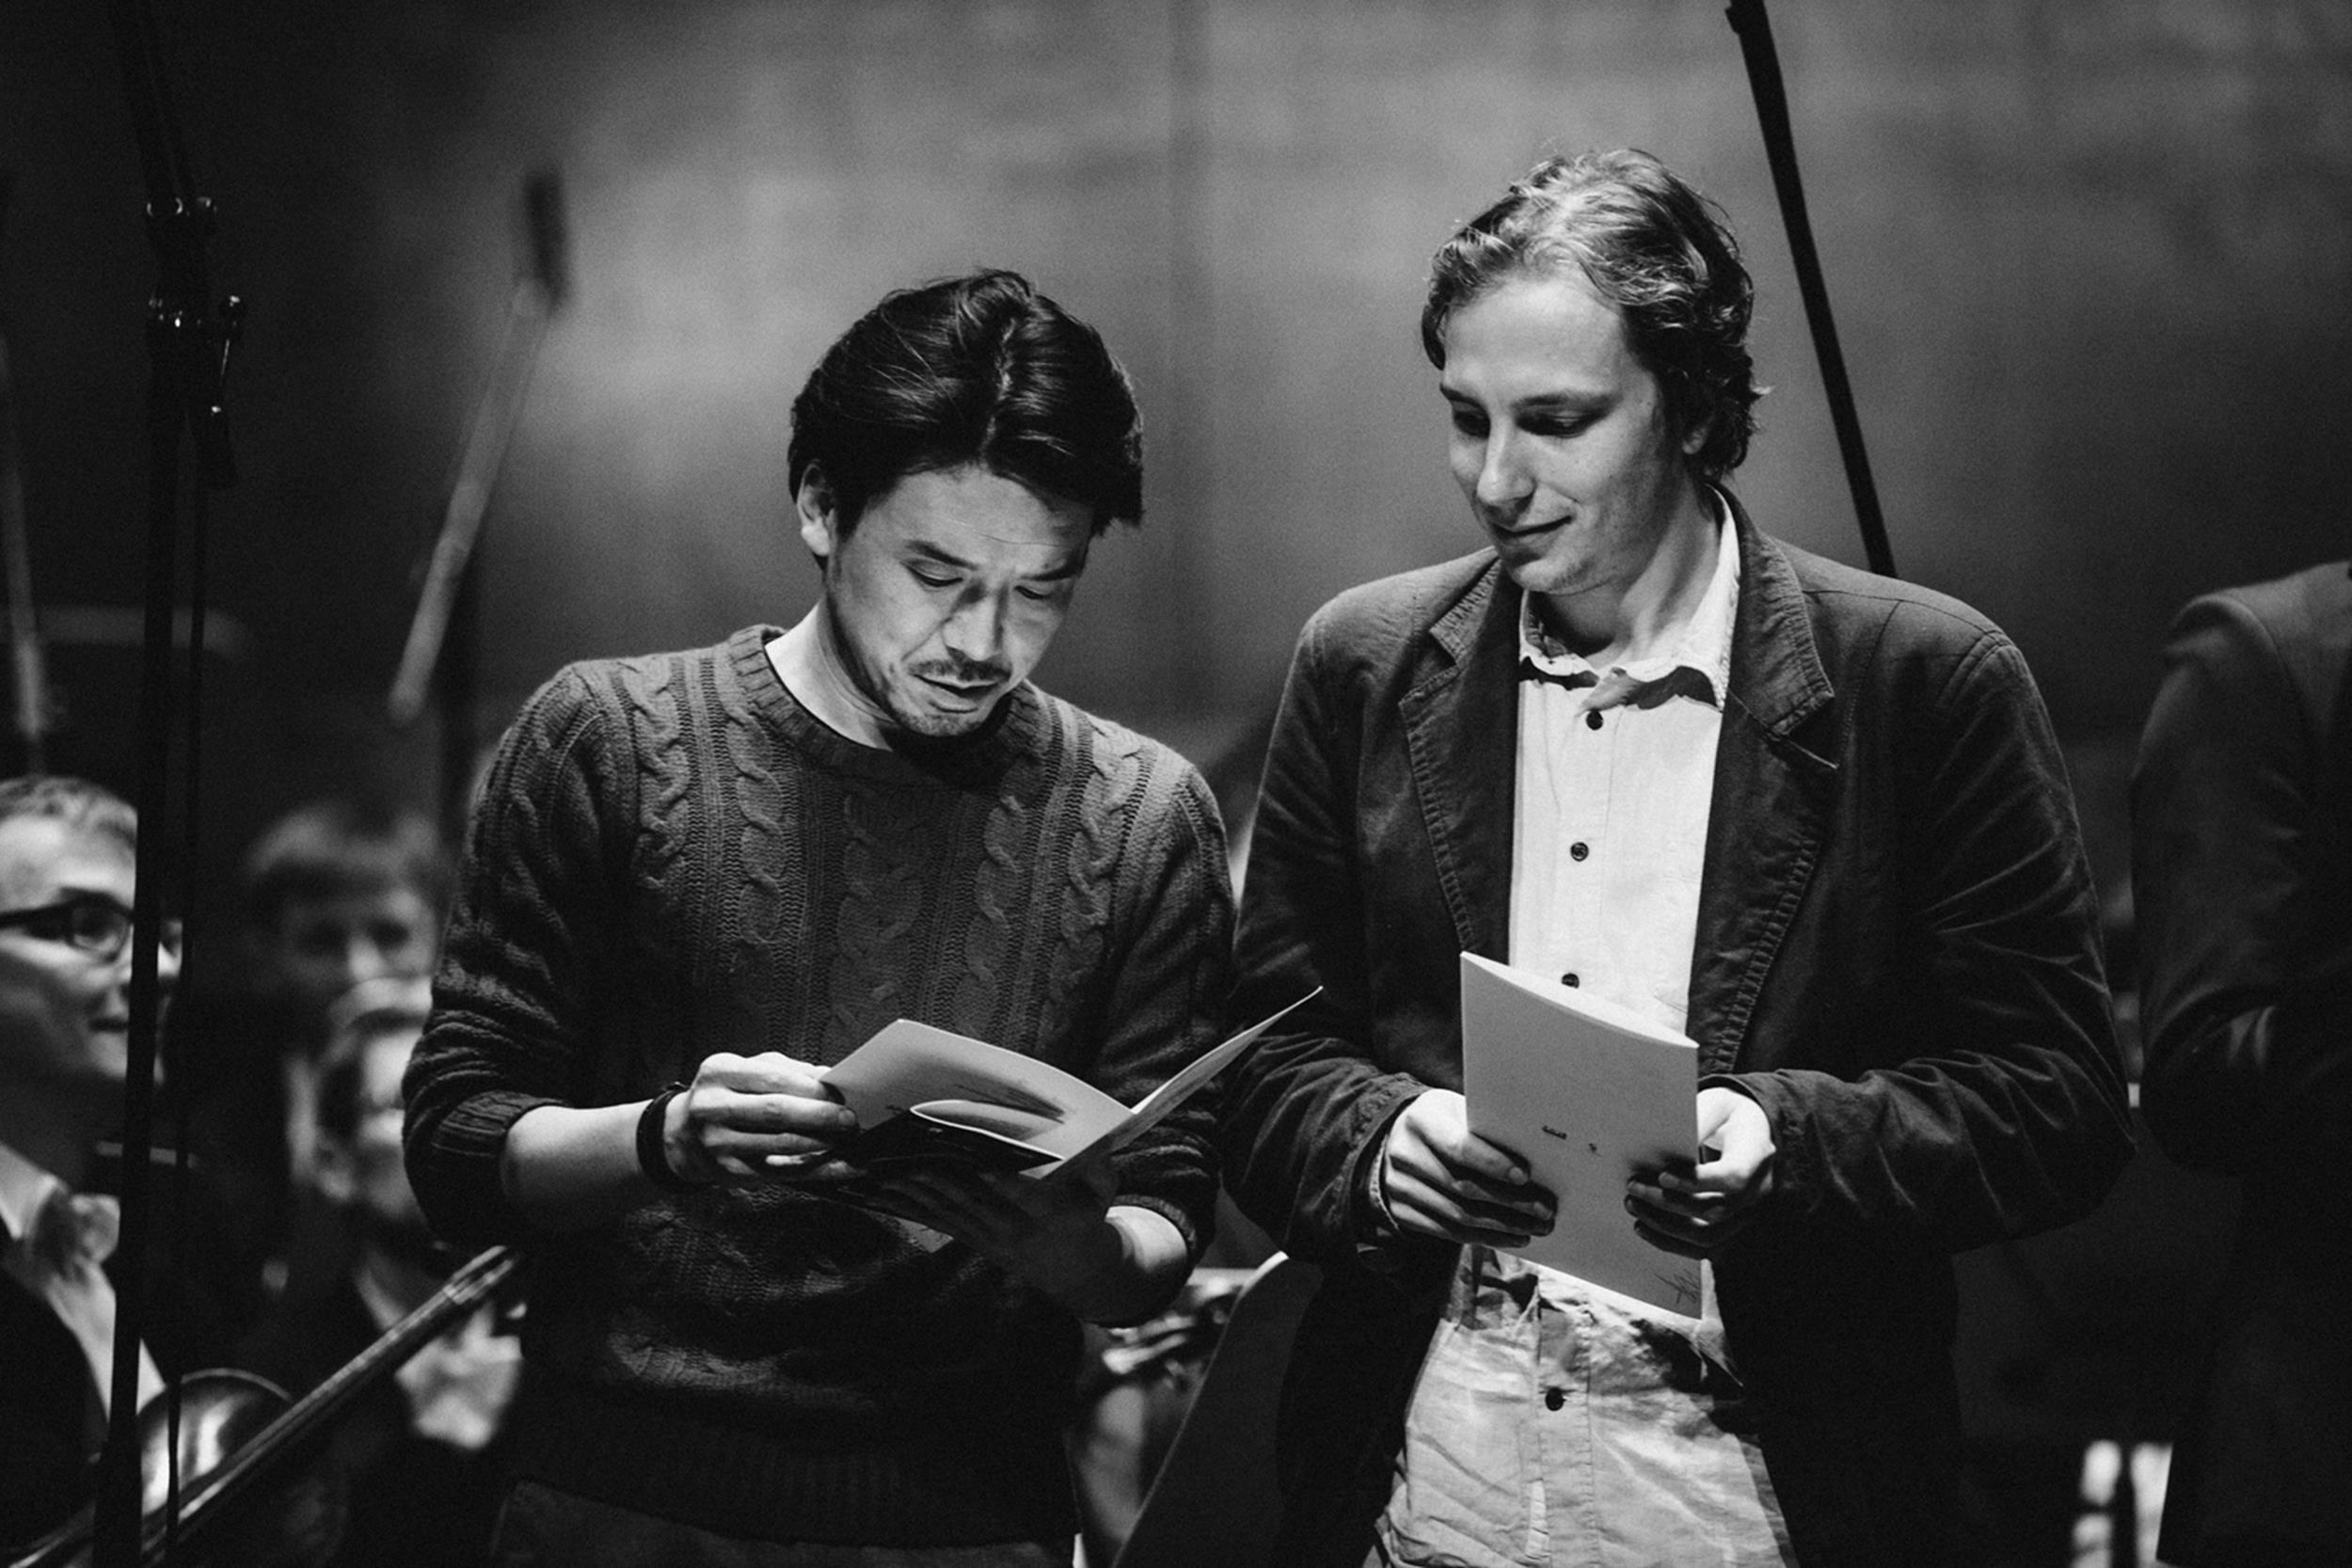 Masashi Kawashima i Otto Wanke Fot. Kinga Karpati&Daniel Zarewicz PRESTIGE PORTRAIT